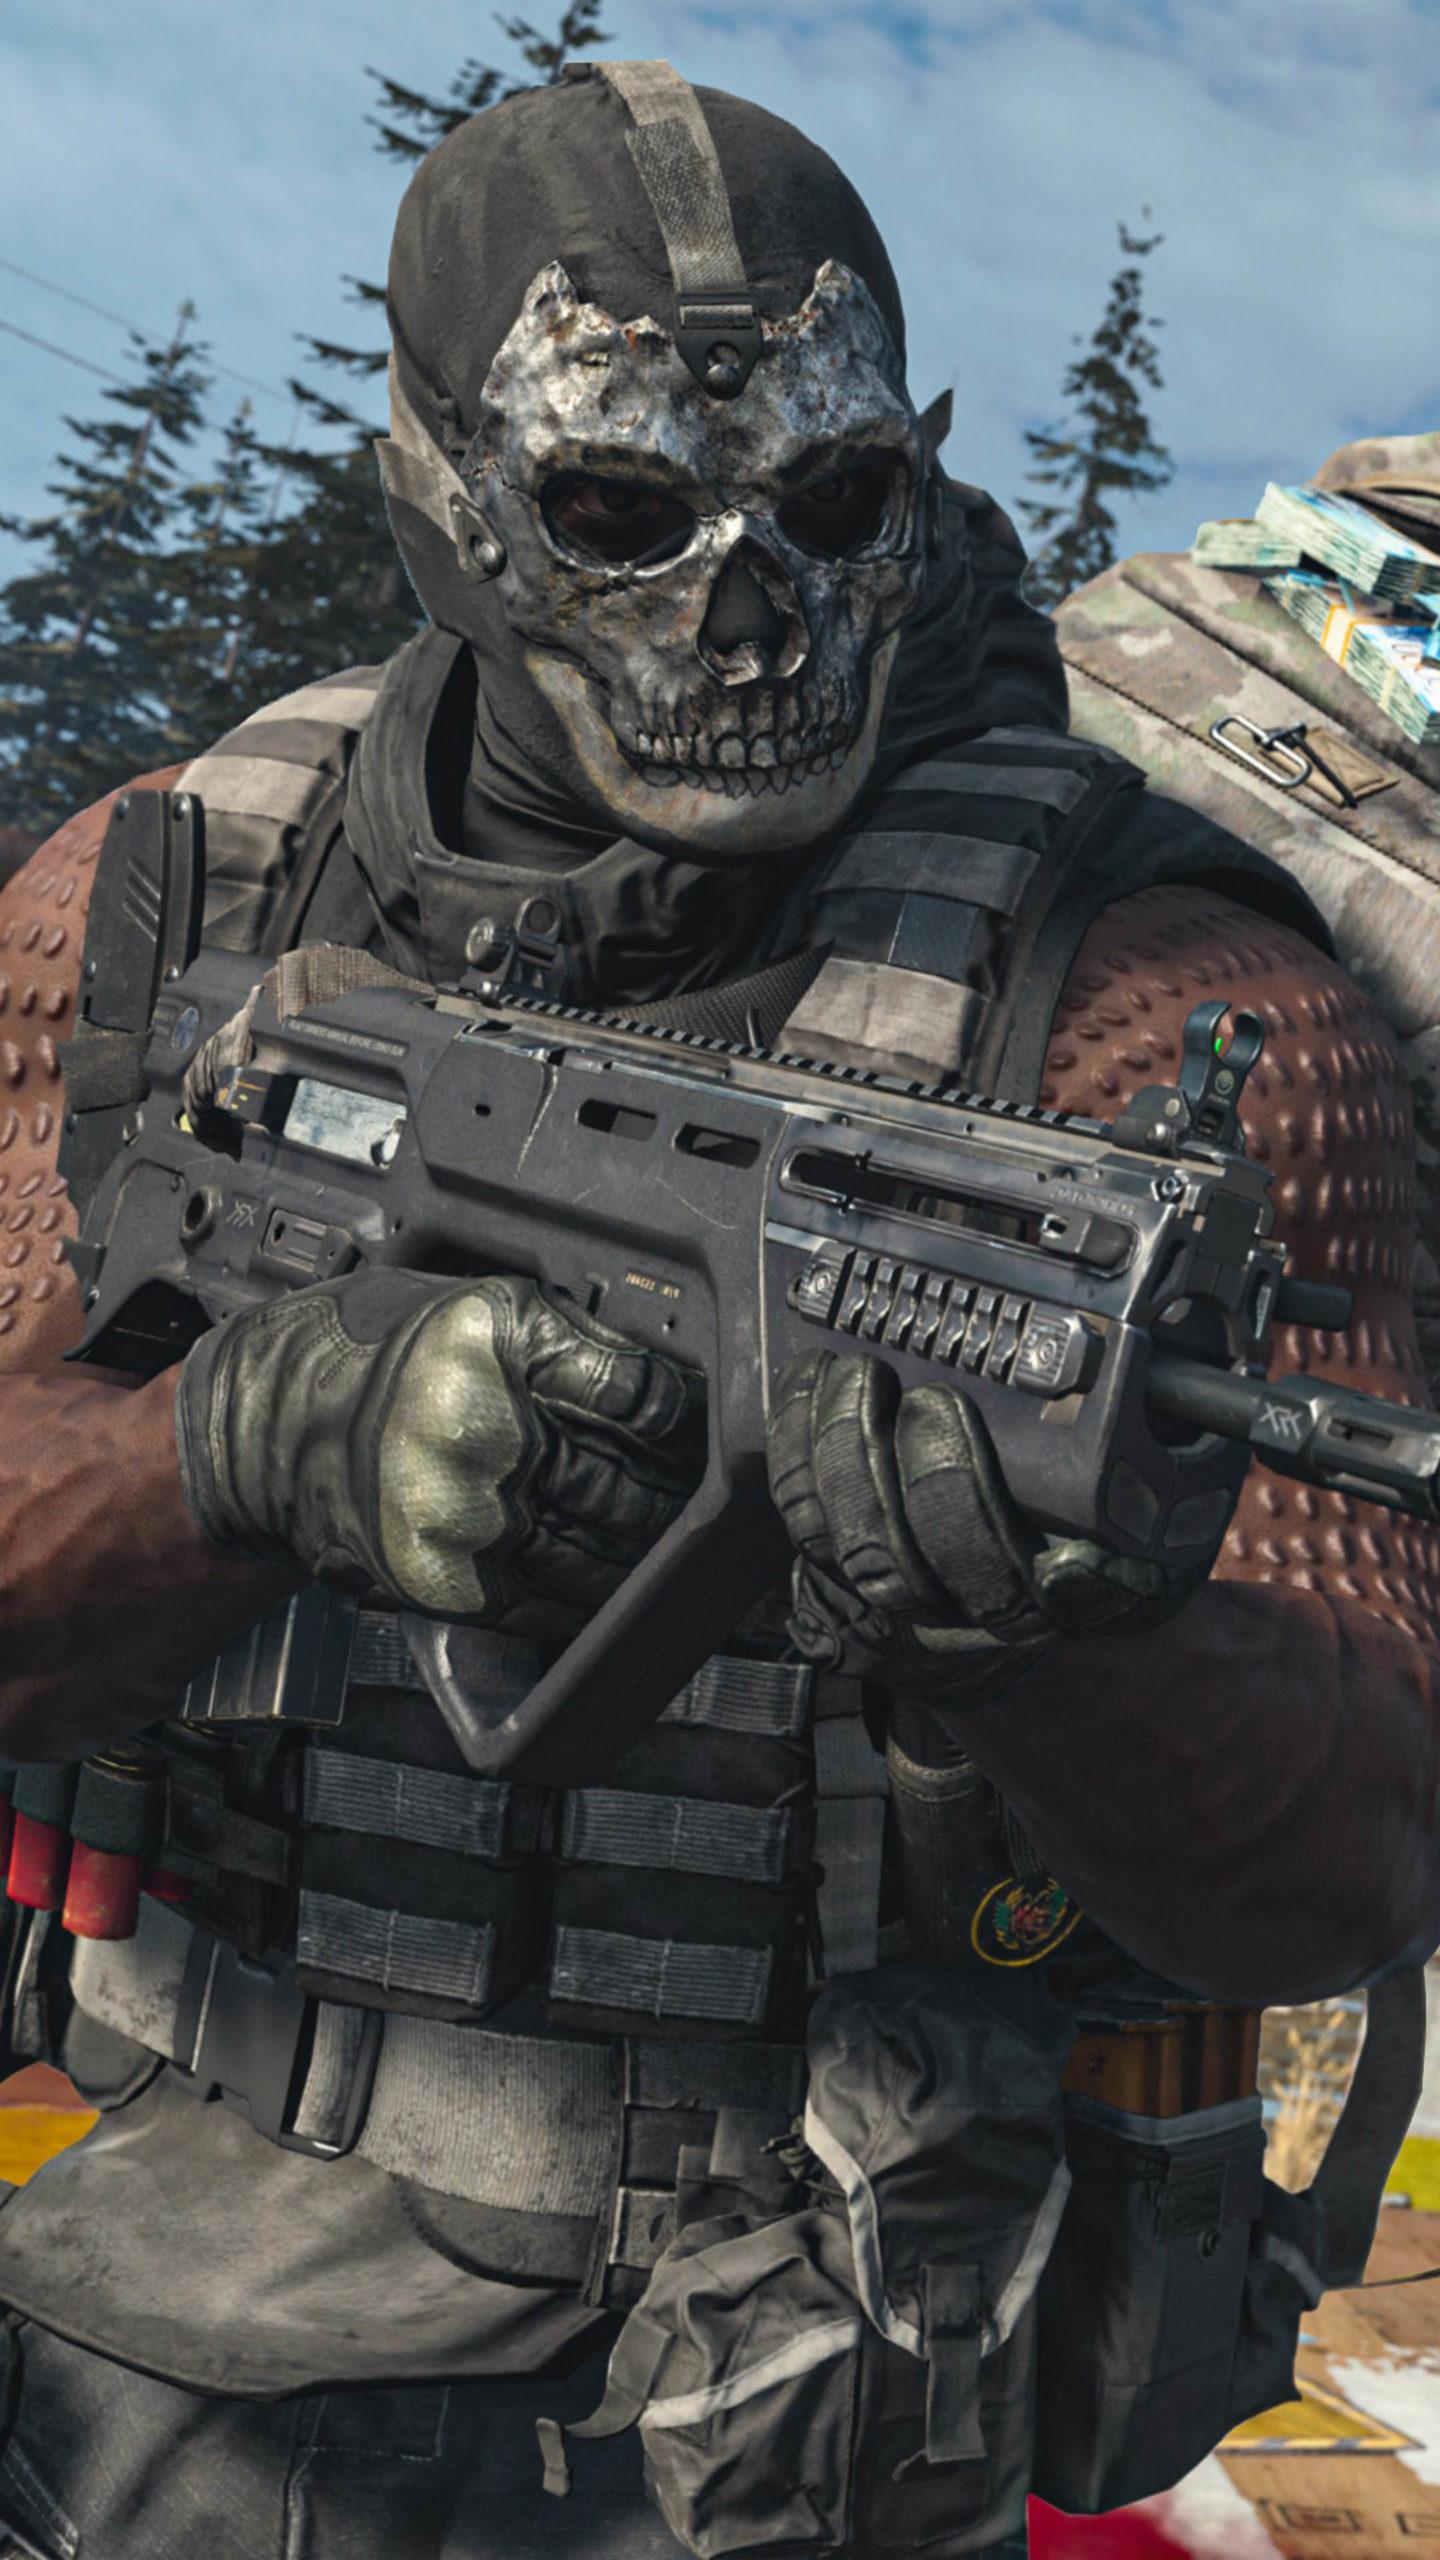 Skull Mask Call Of Duty Warzone 4k Ultra Hd Mobile Wallpaper